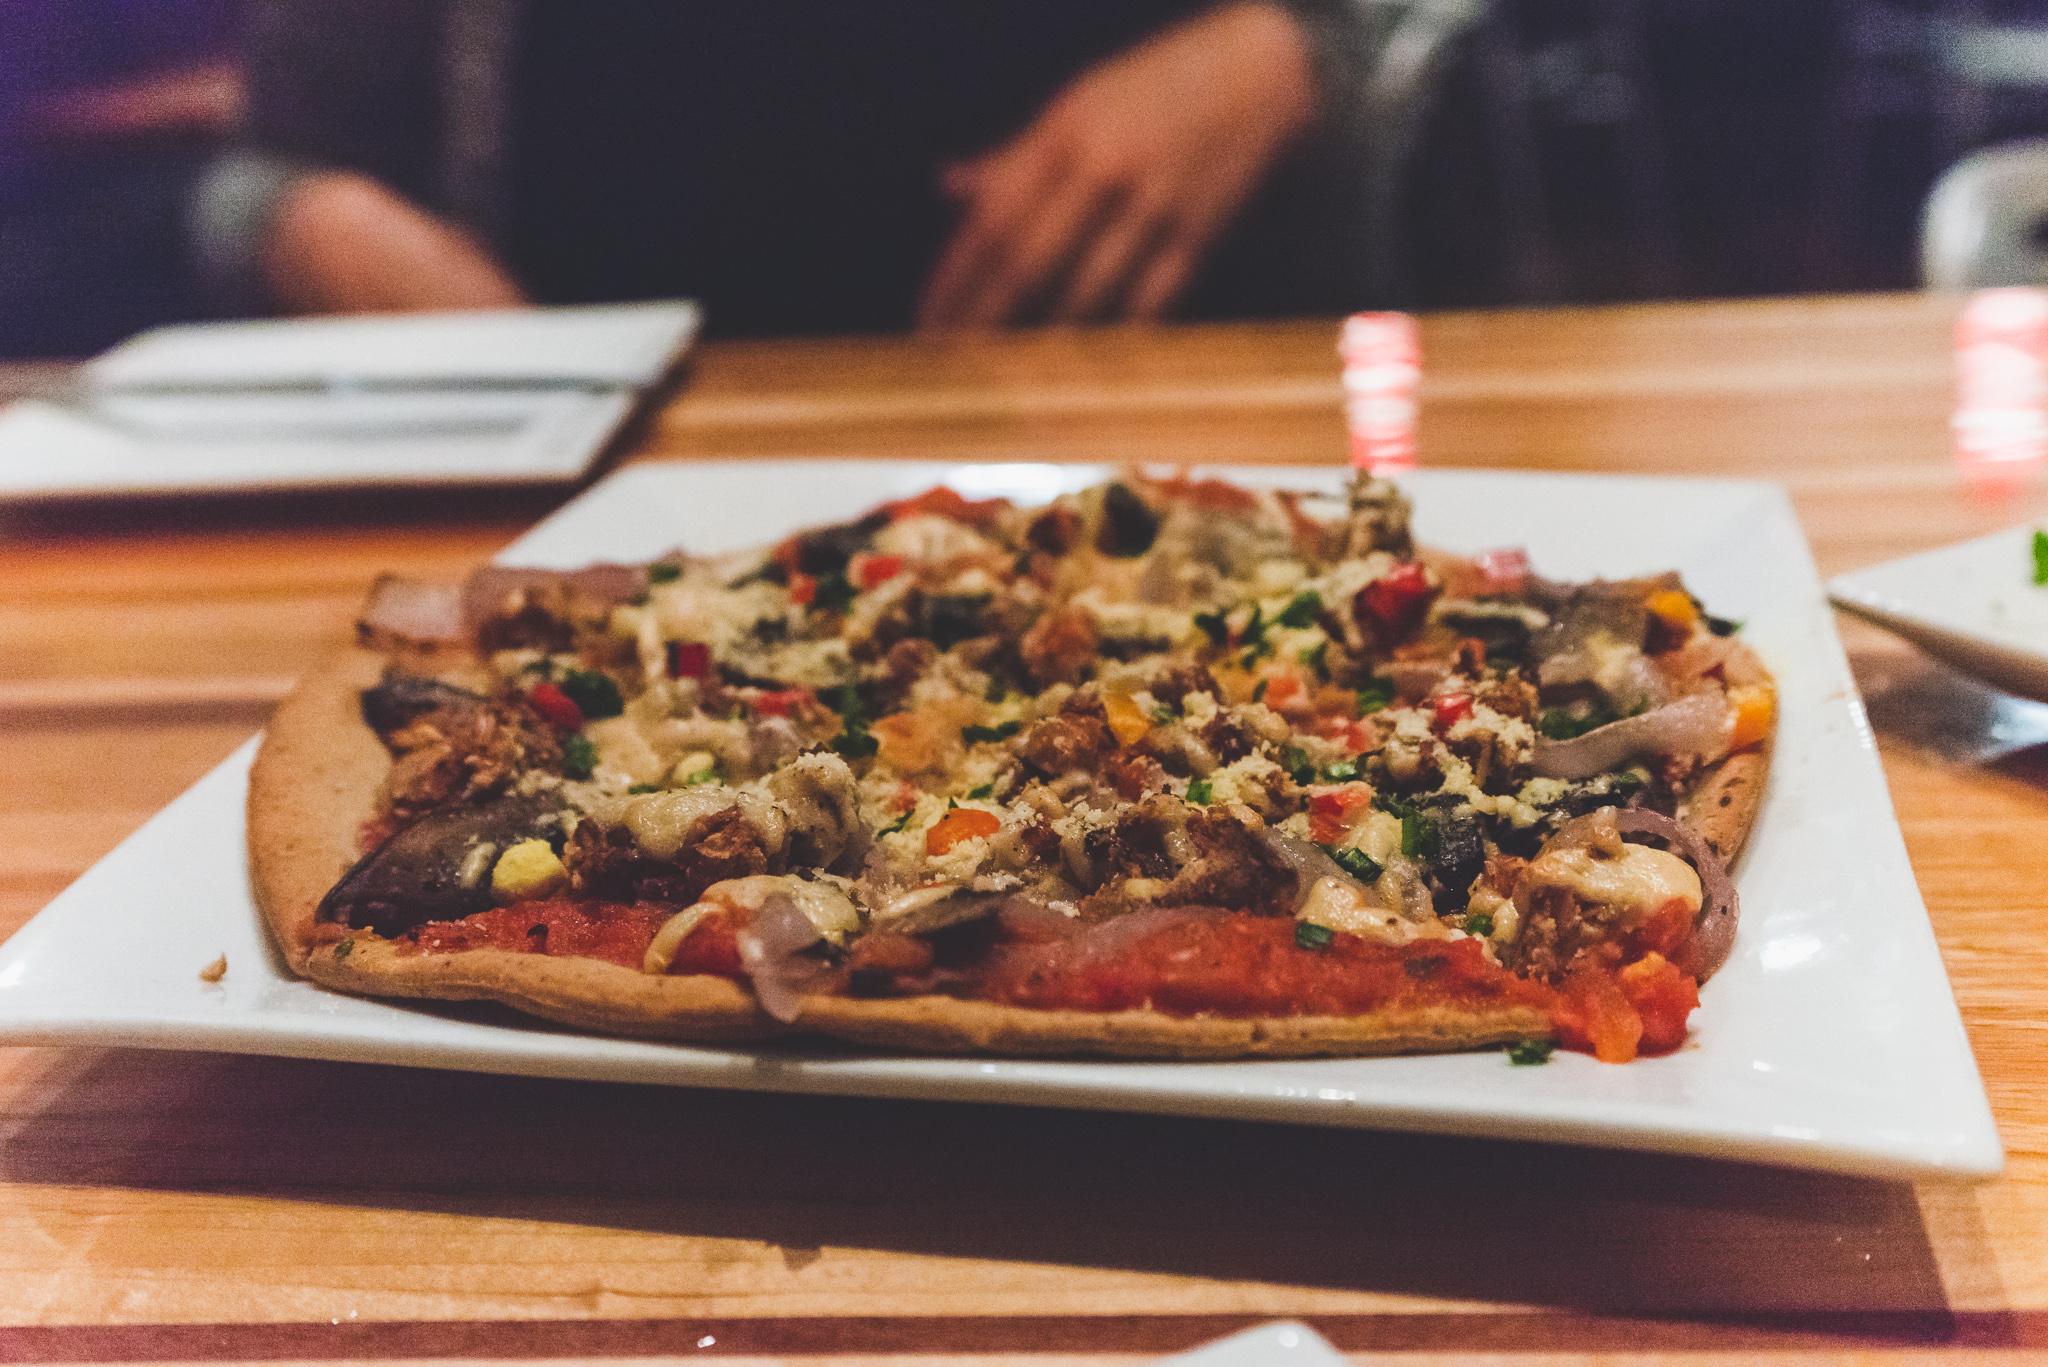 Roasted vegetable pizza / 4/28/16 / Zest / Salt Lake City, UT